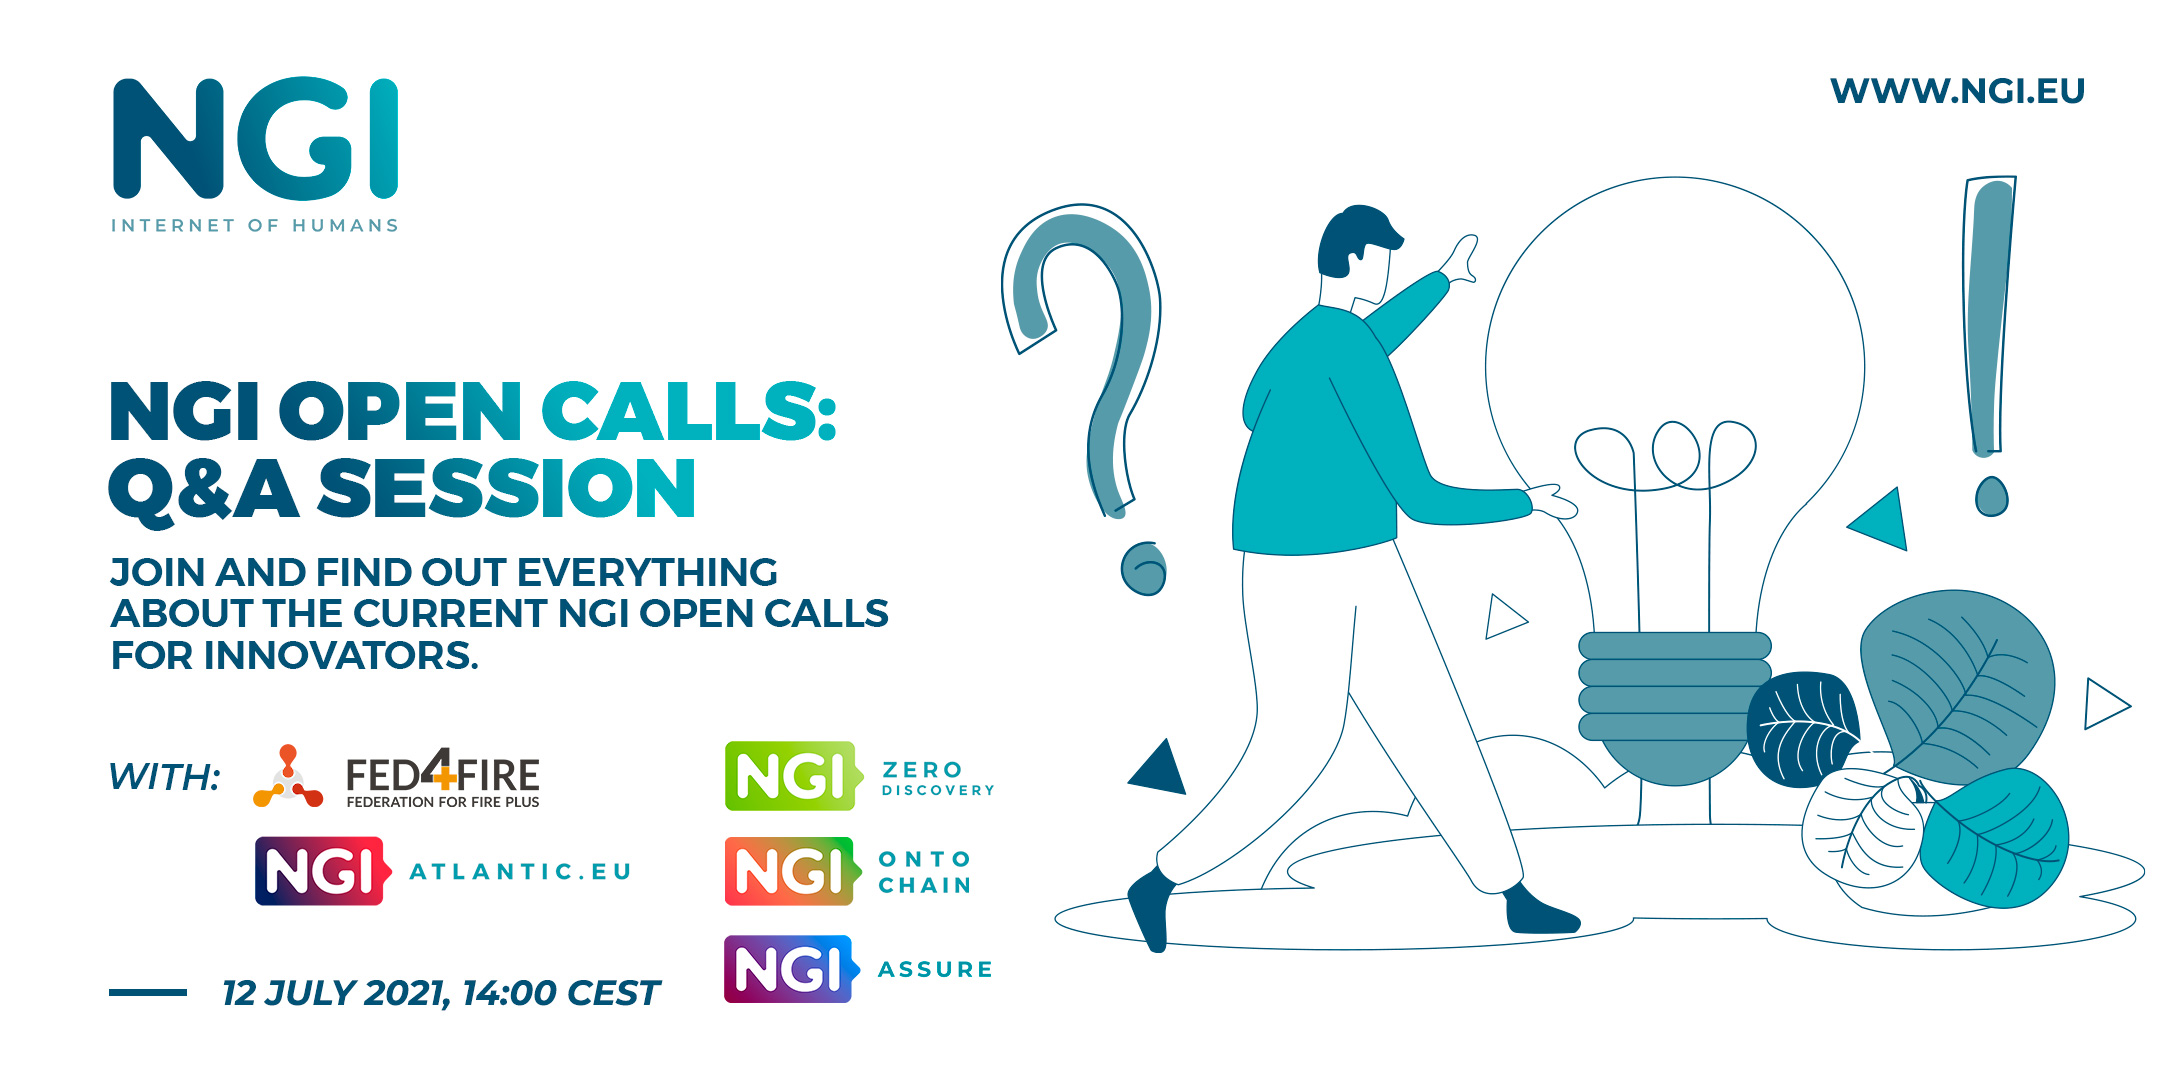 NGI Open Calls: Q&A Session